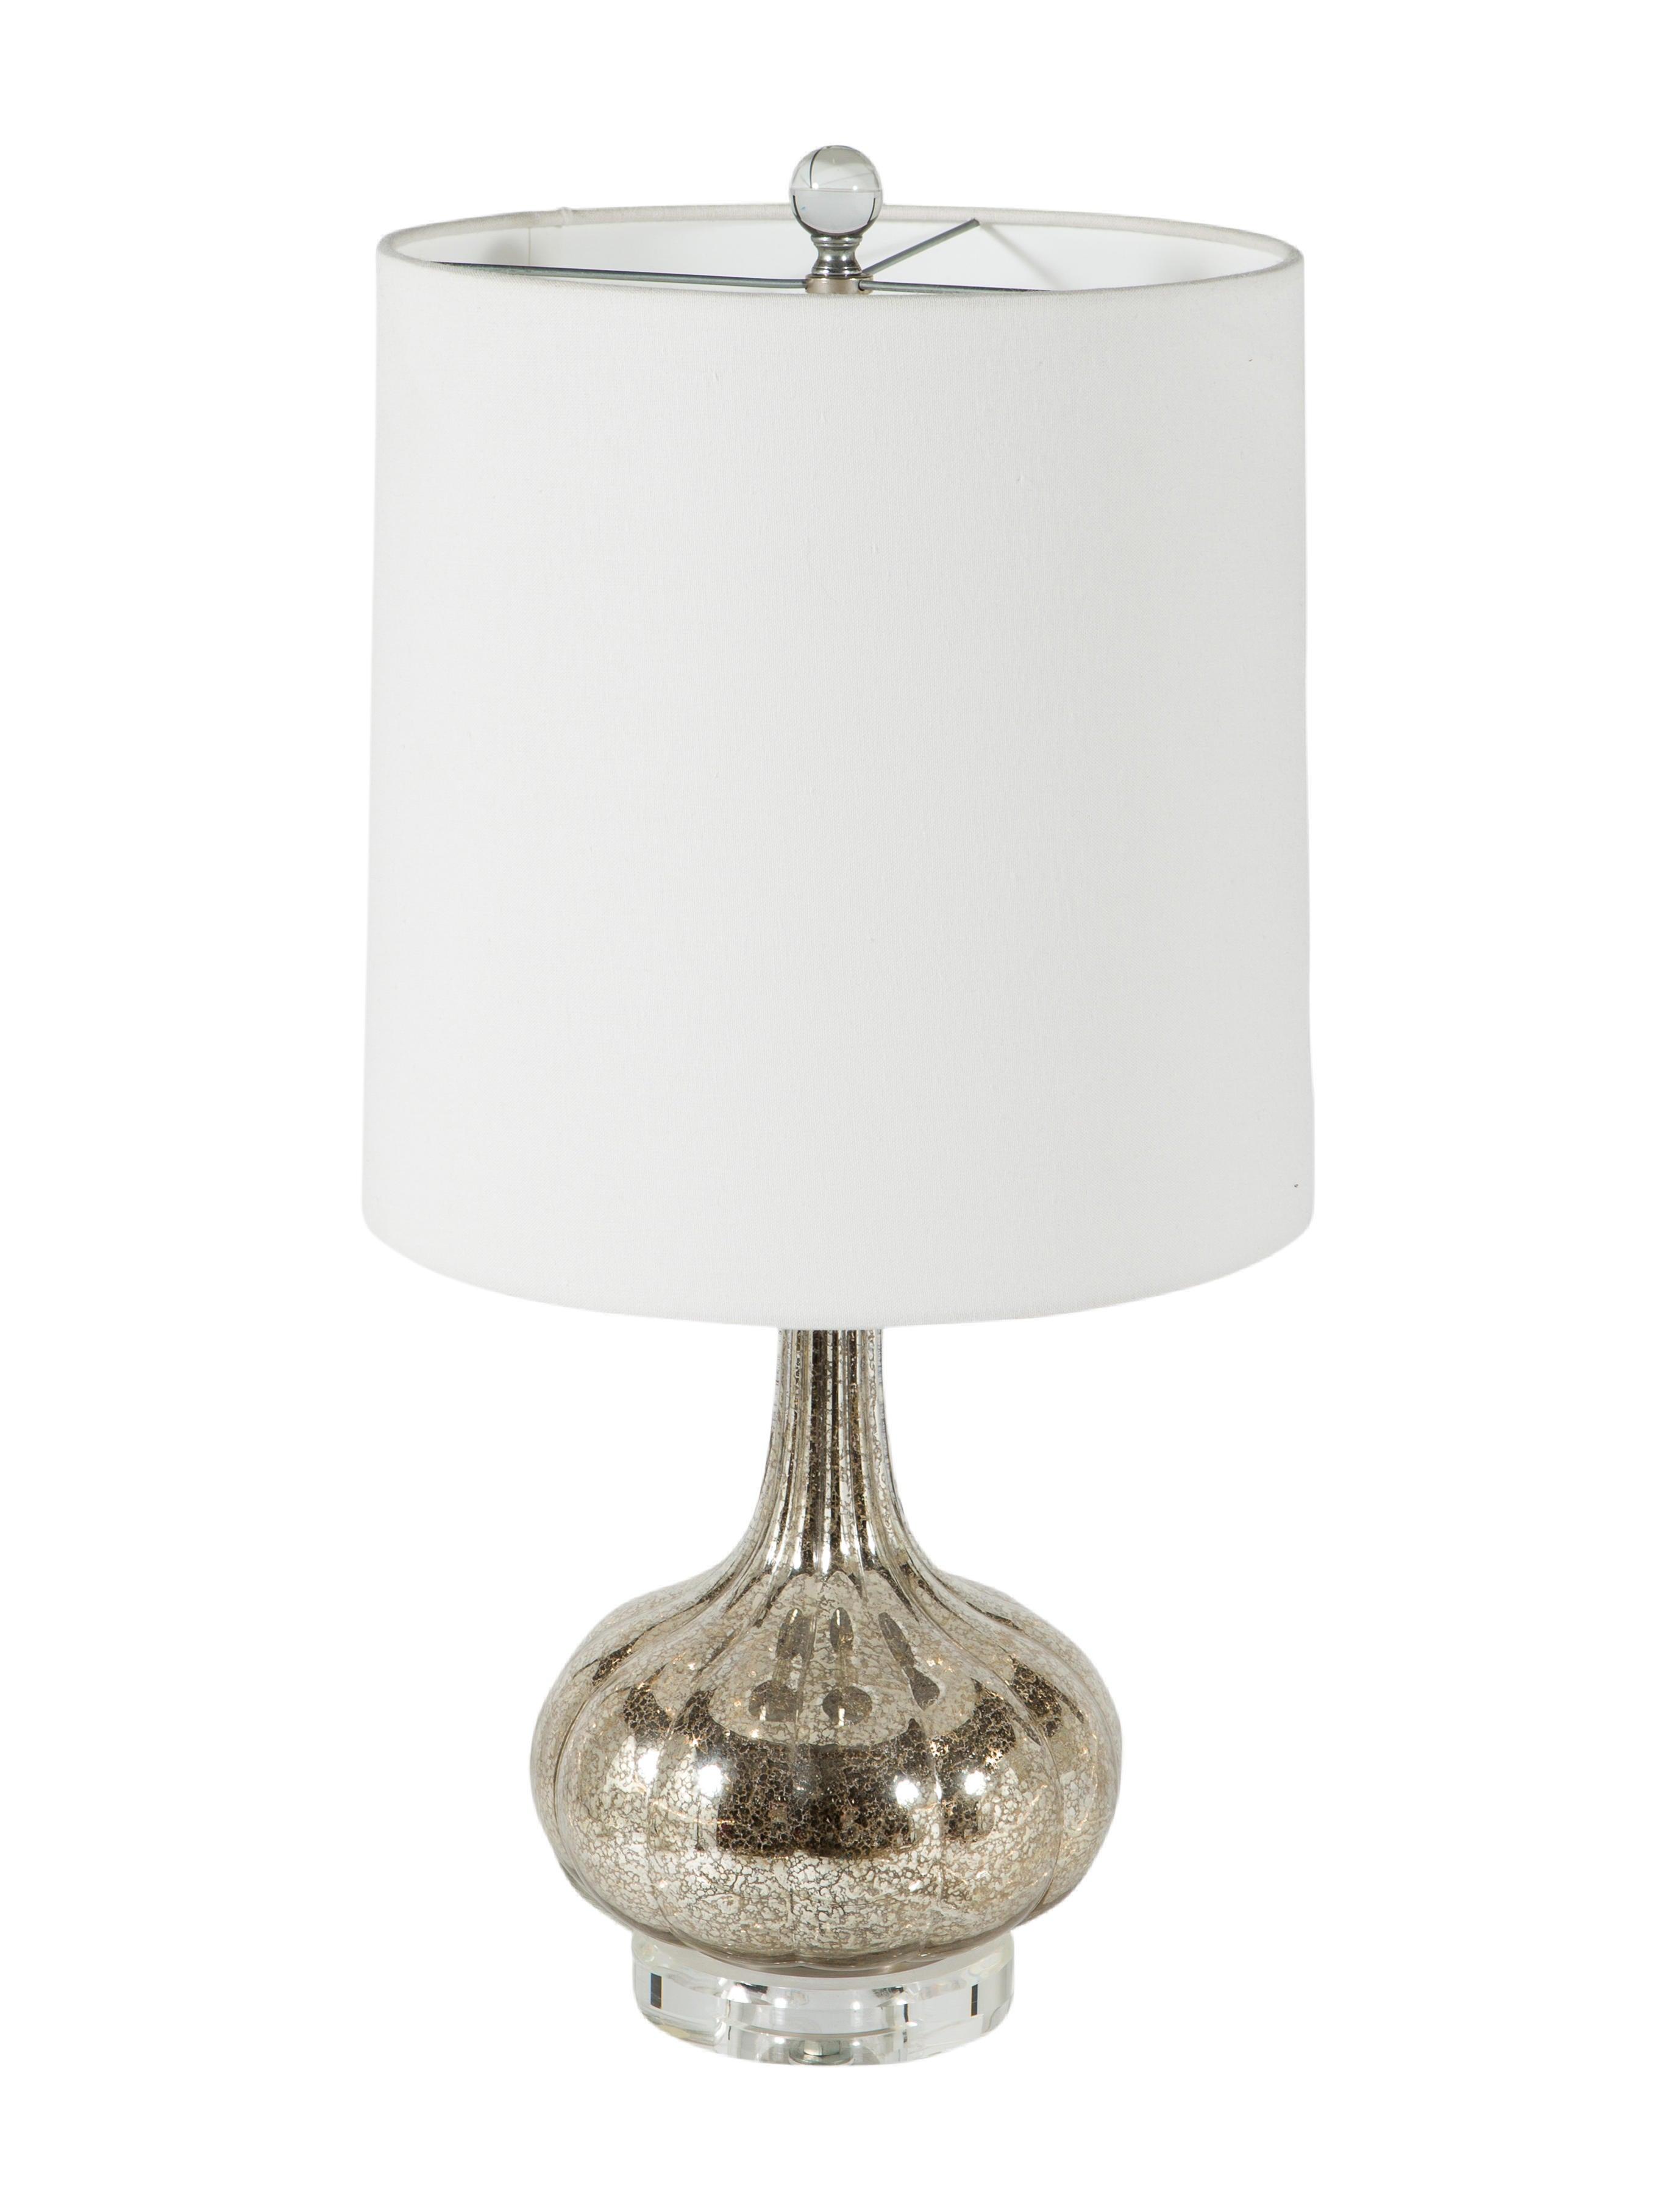 design lighting orb lamps free mini andrew lamp alabaster regina